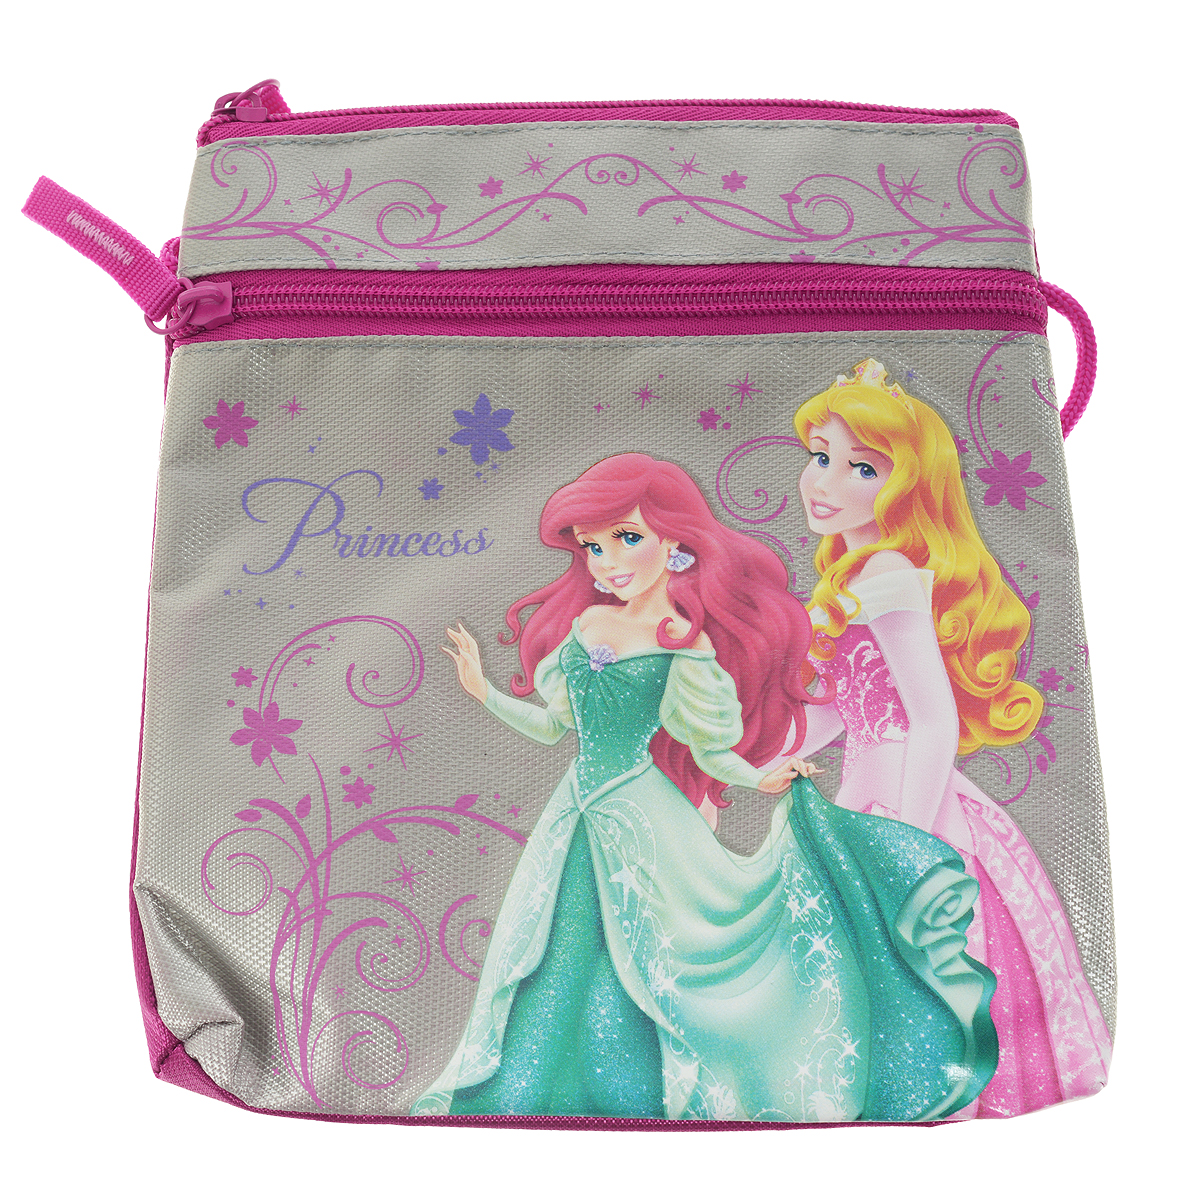 Сумка детская Princess, цвет: серый, розовый сумочка princess цвет розовый prcb ut4 4017